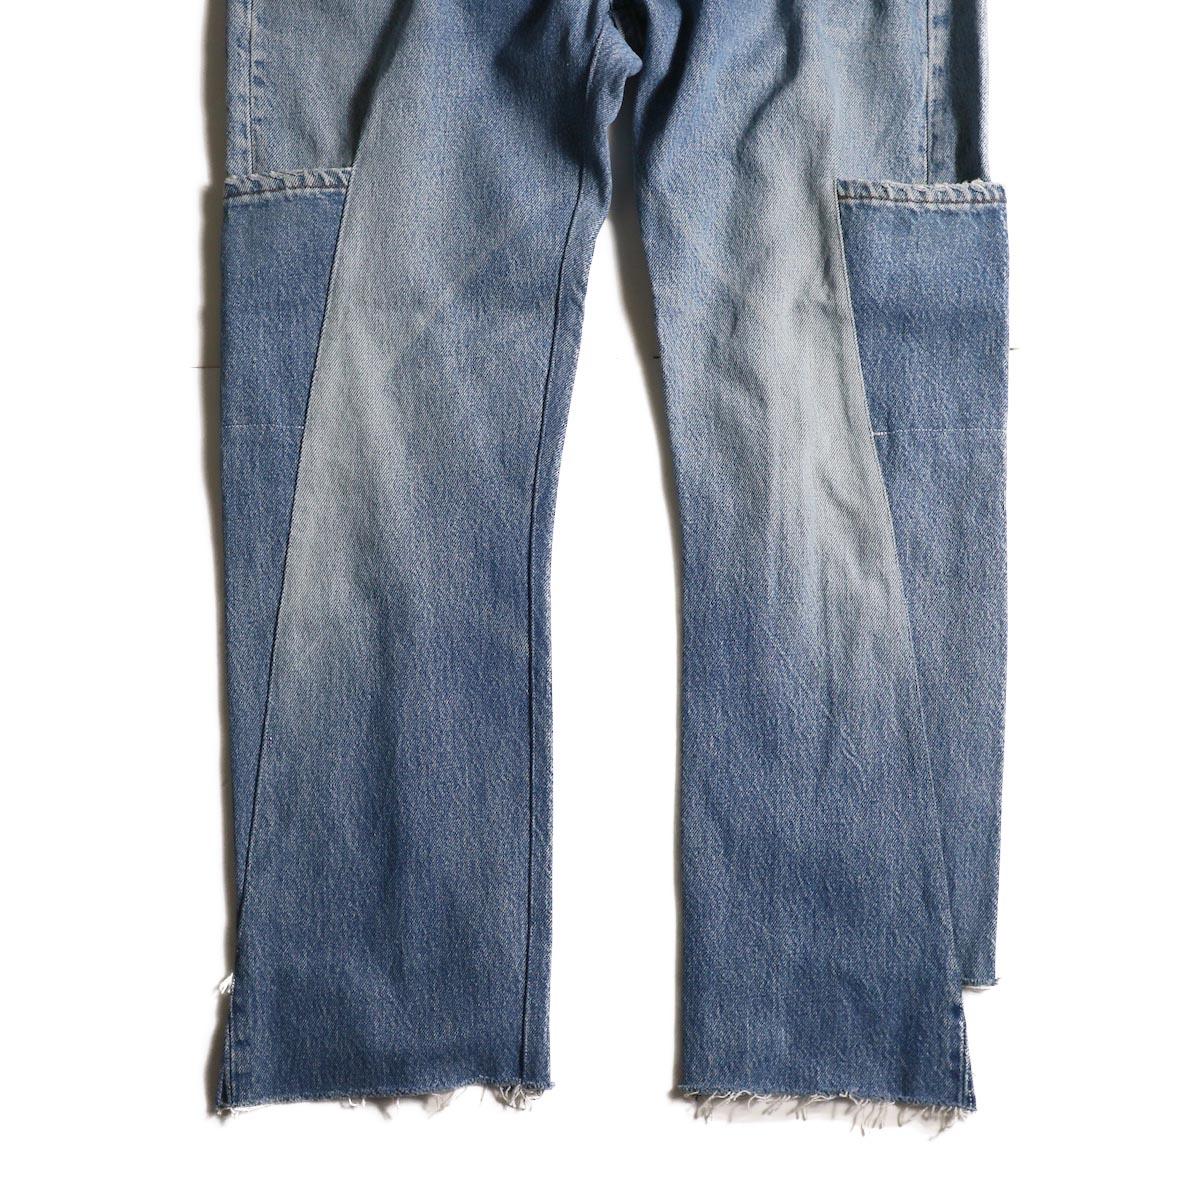 OLD PARK / 7Pocket Jeans -Blue (Msize-A)ポケット、裾